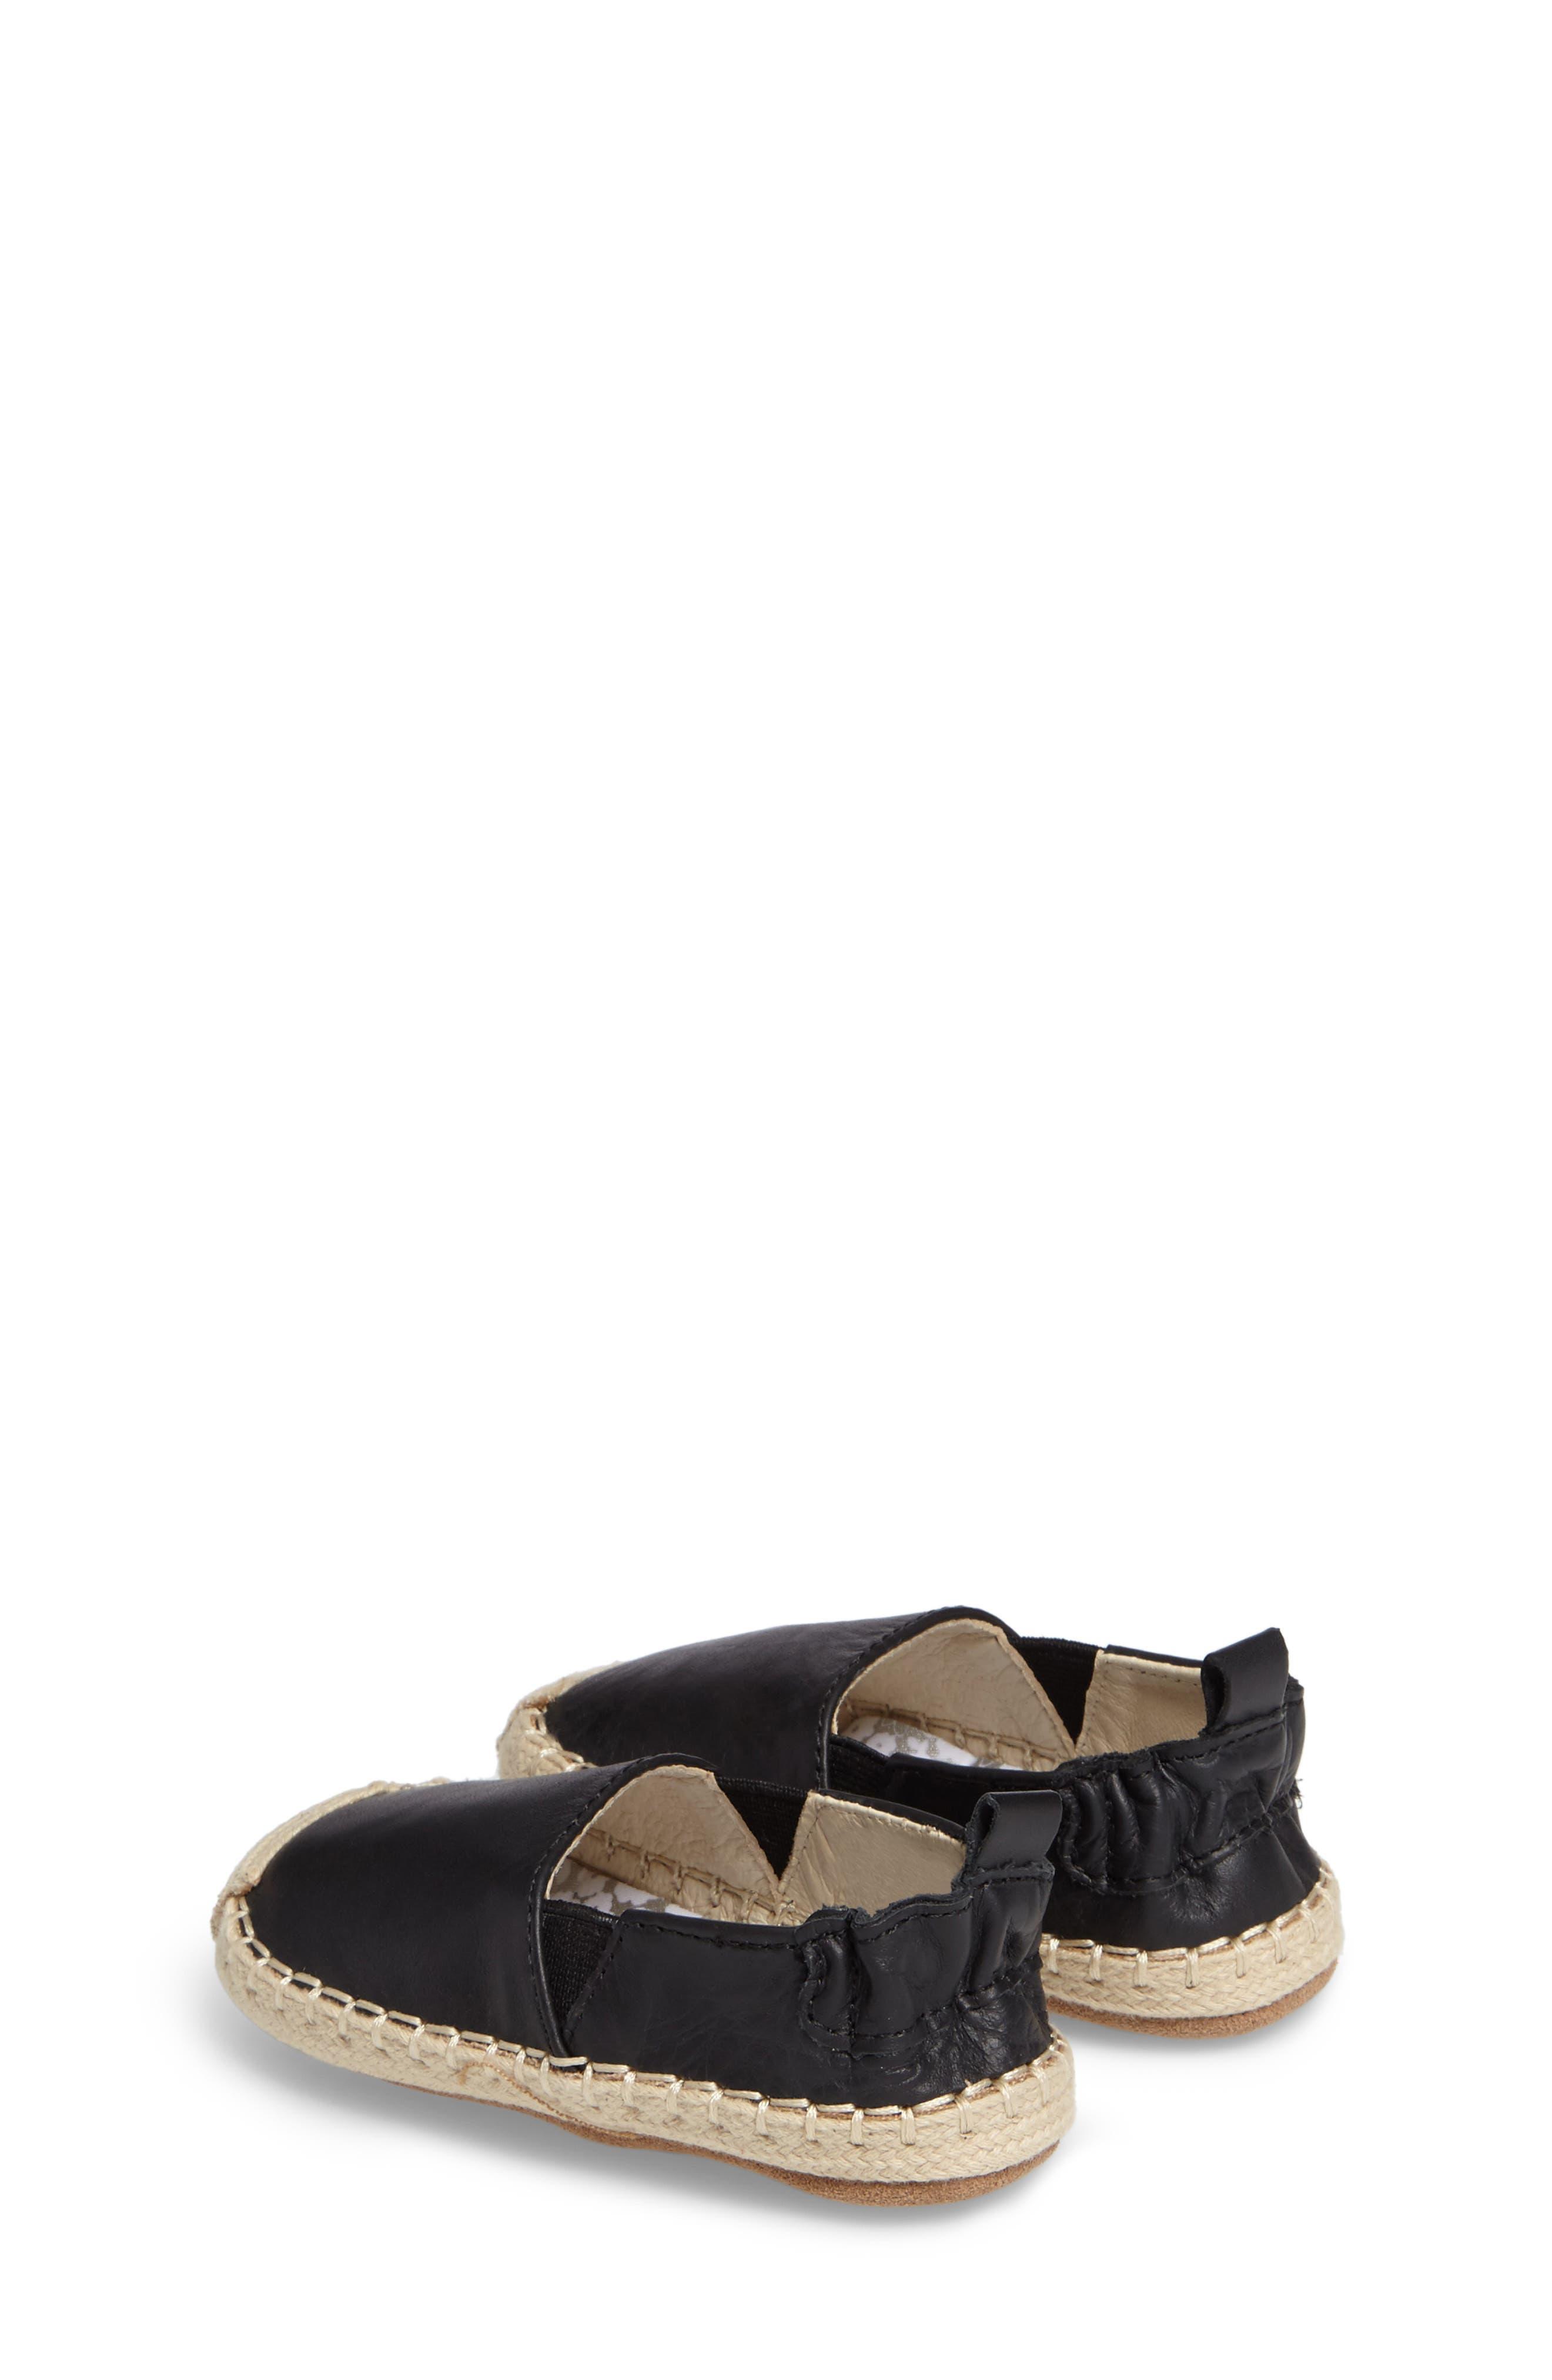 Ellie Crib Shoe,                             Alternate thumbnail 2, color,                             Black Leather